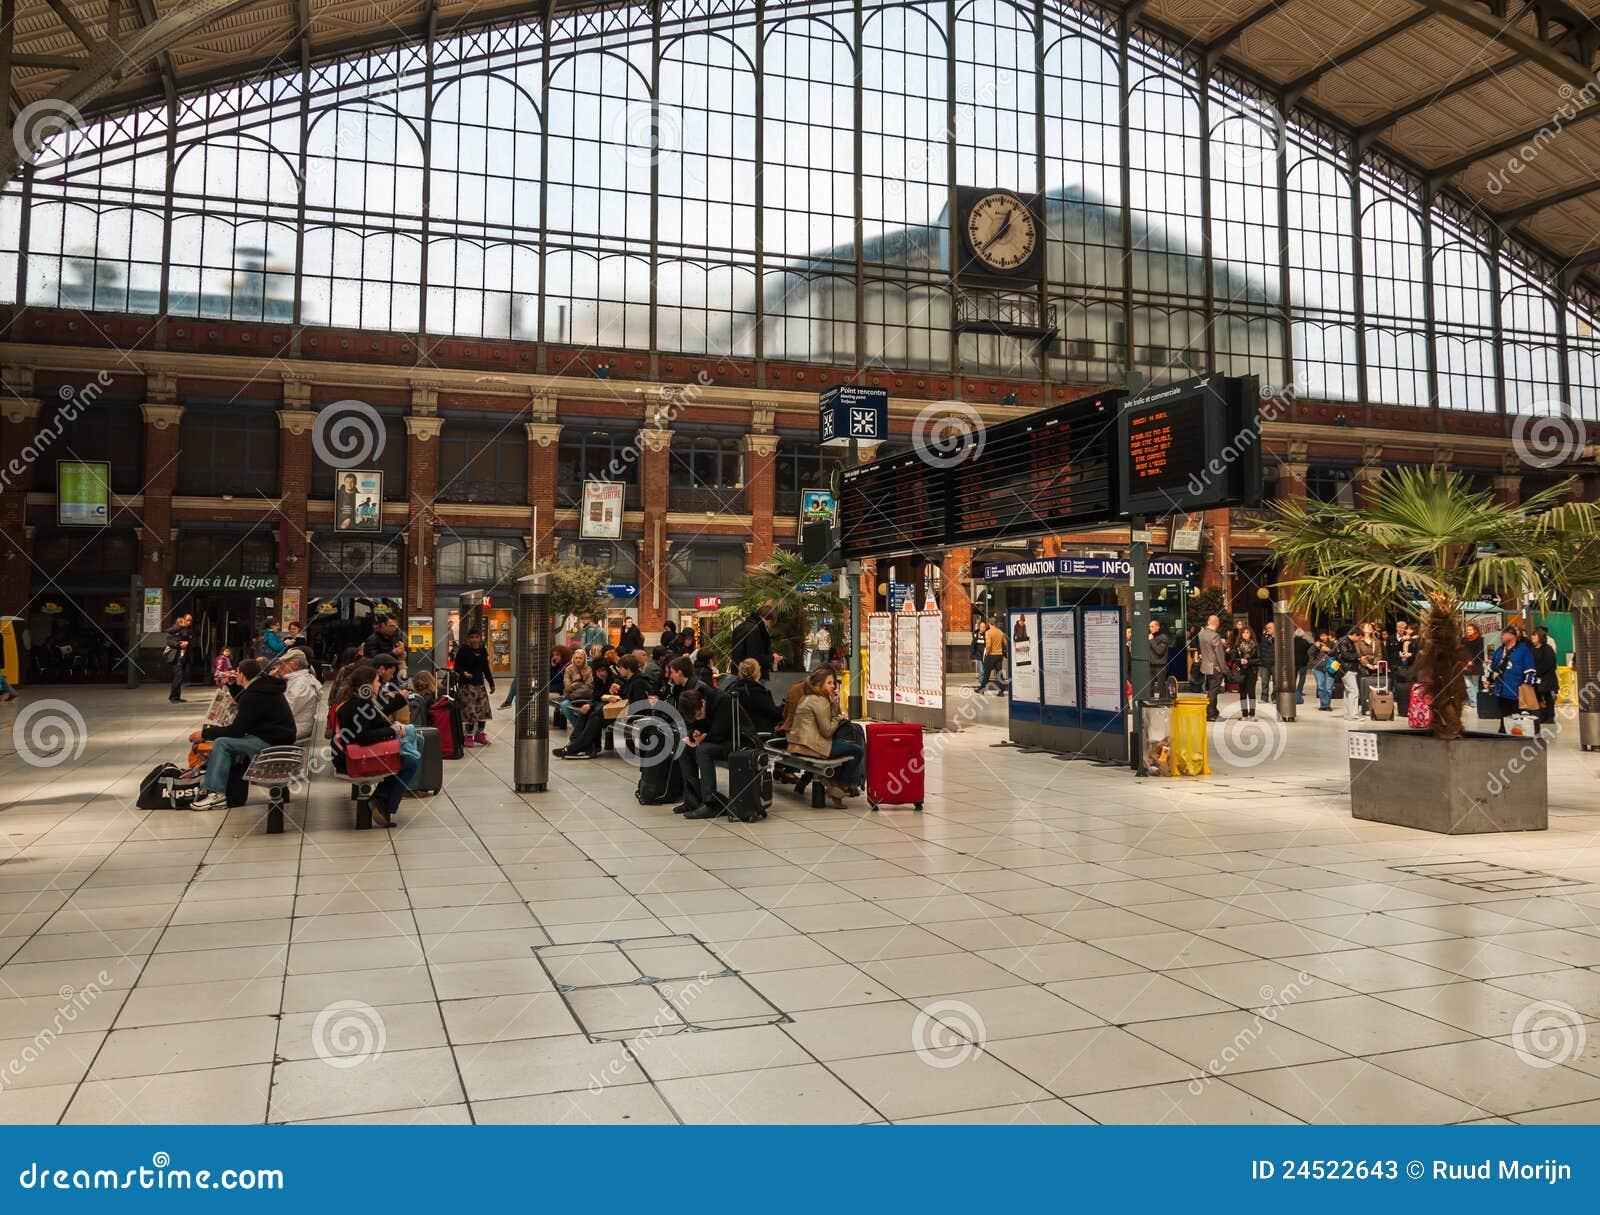 Hall de station de train lille flandres photo stock - Cabinet d ophtalmologie des flandres lille ...